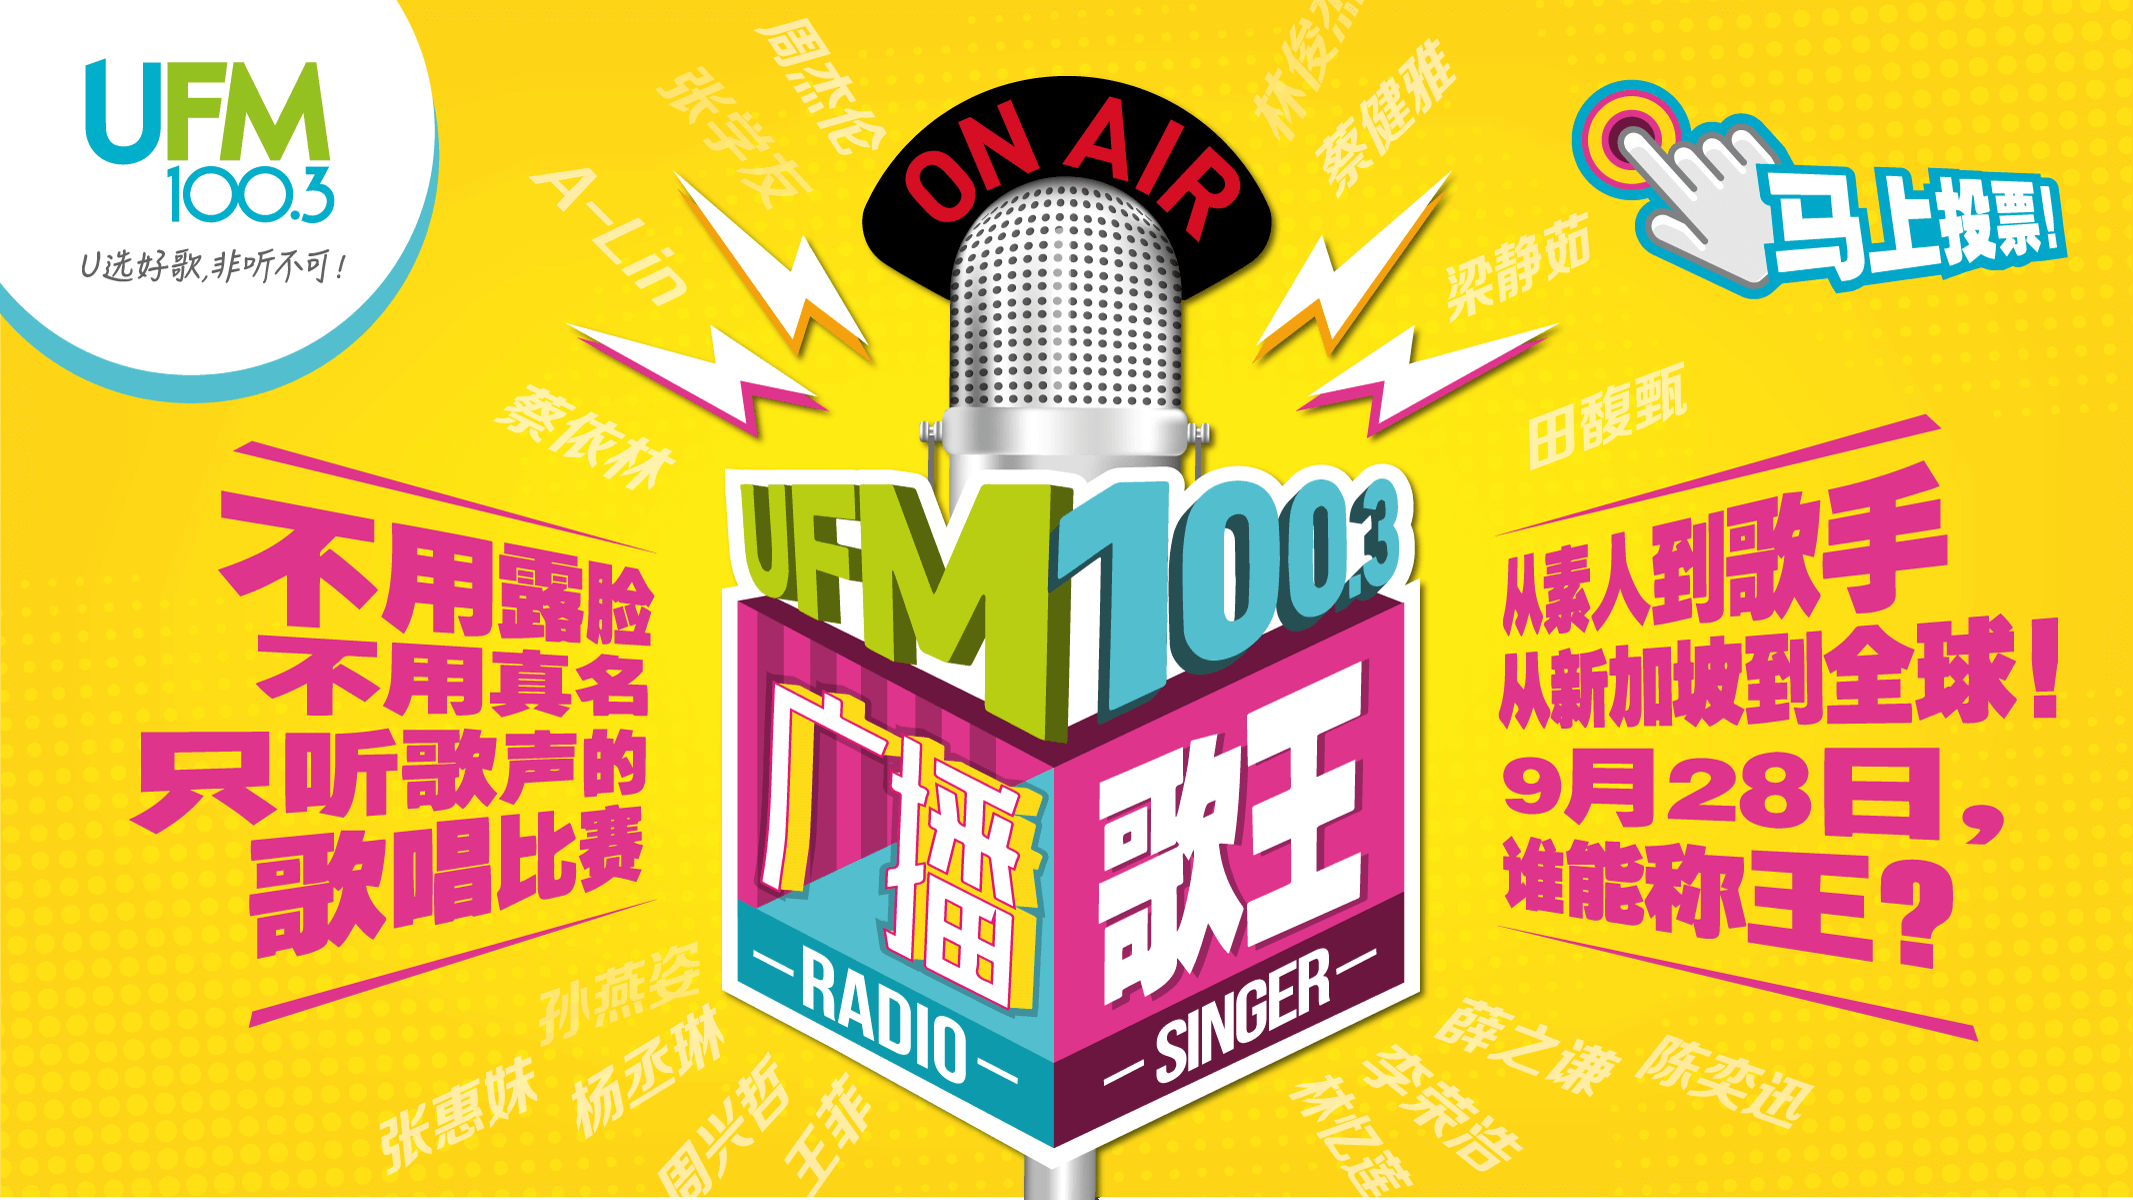 UFM100.3 广播歌王